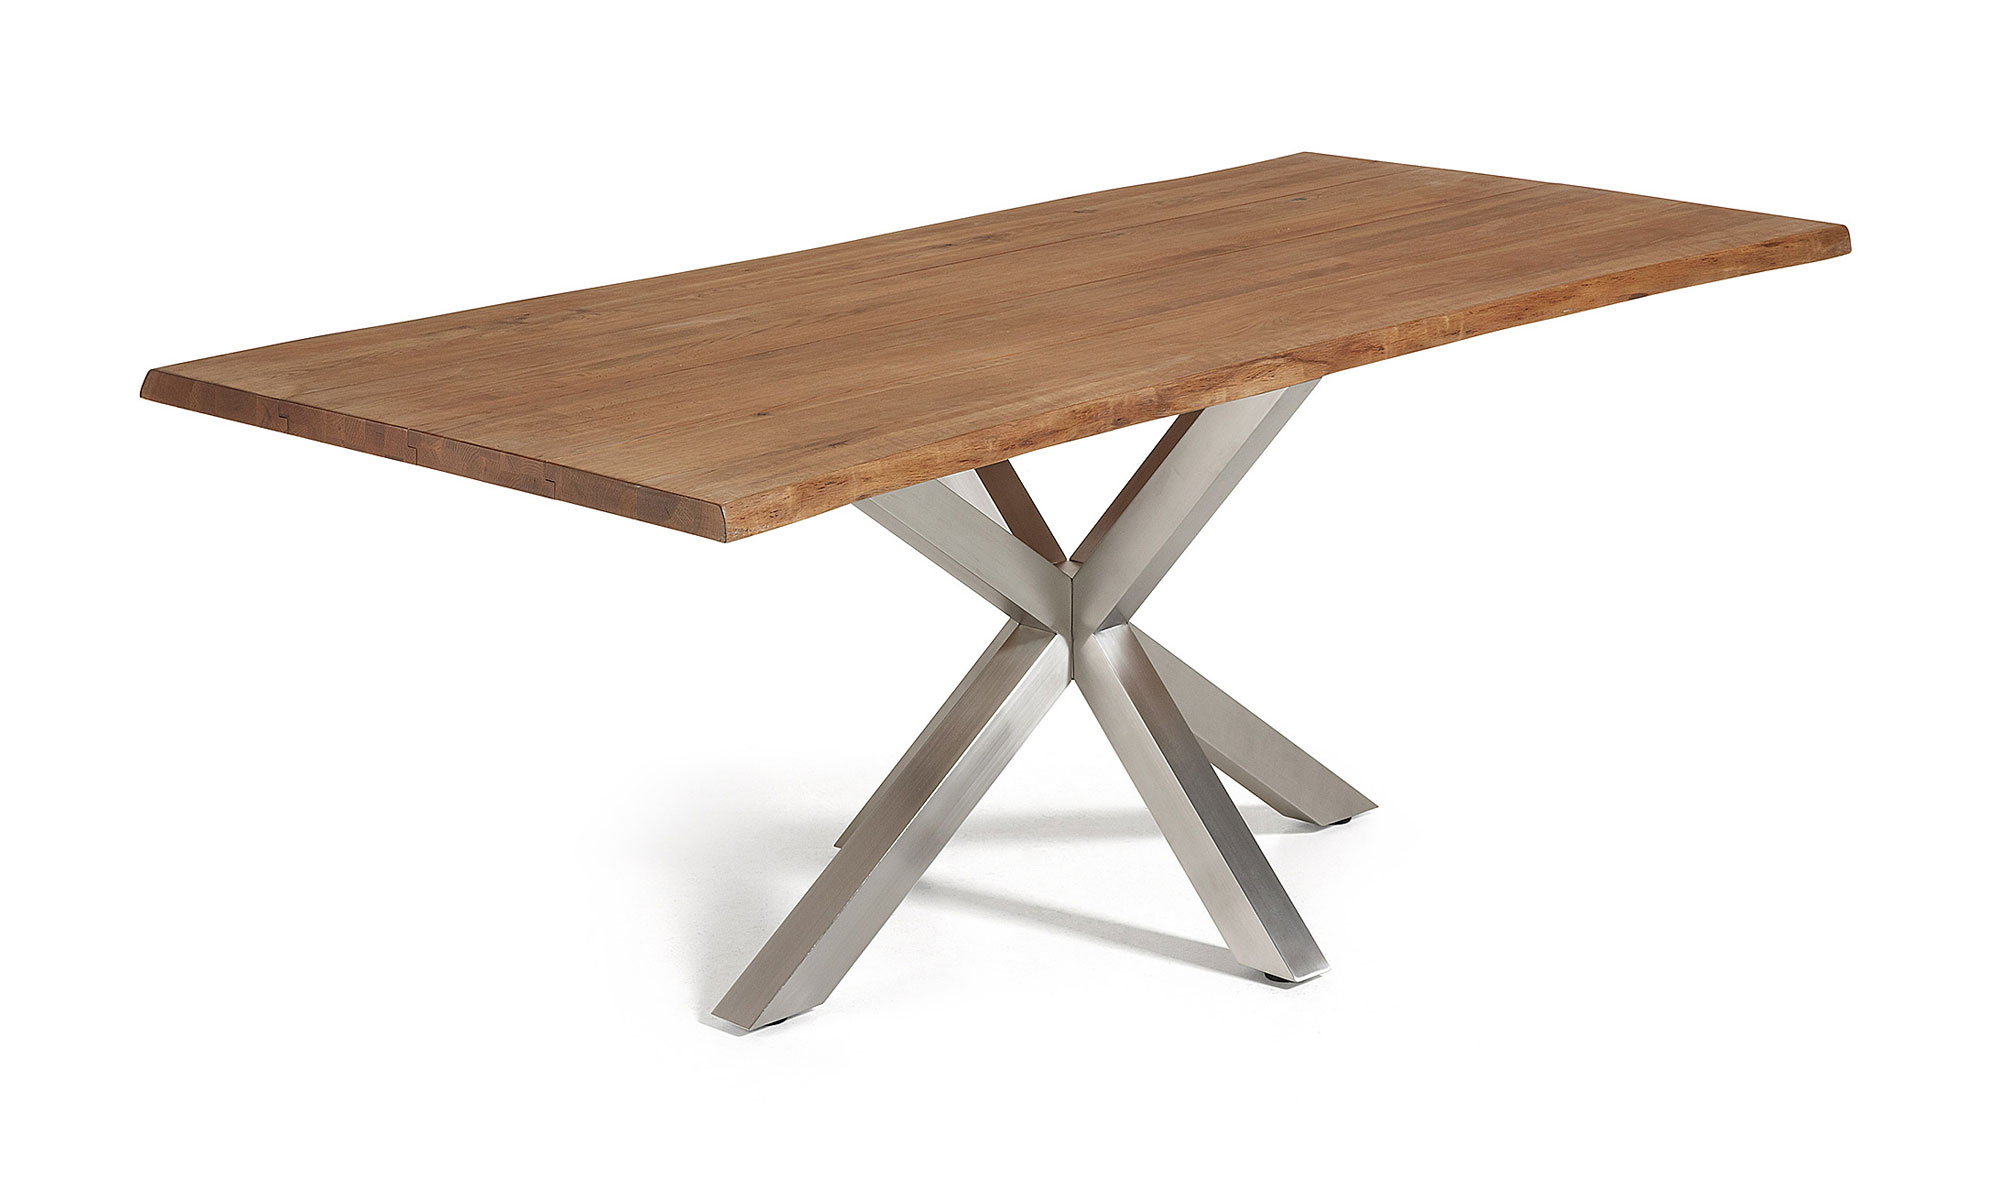 Mesa comedor roble antiguo moderna arya no disponible en for Muebles de roble antiguos